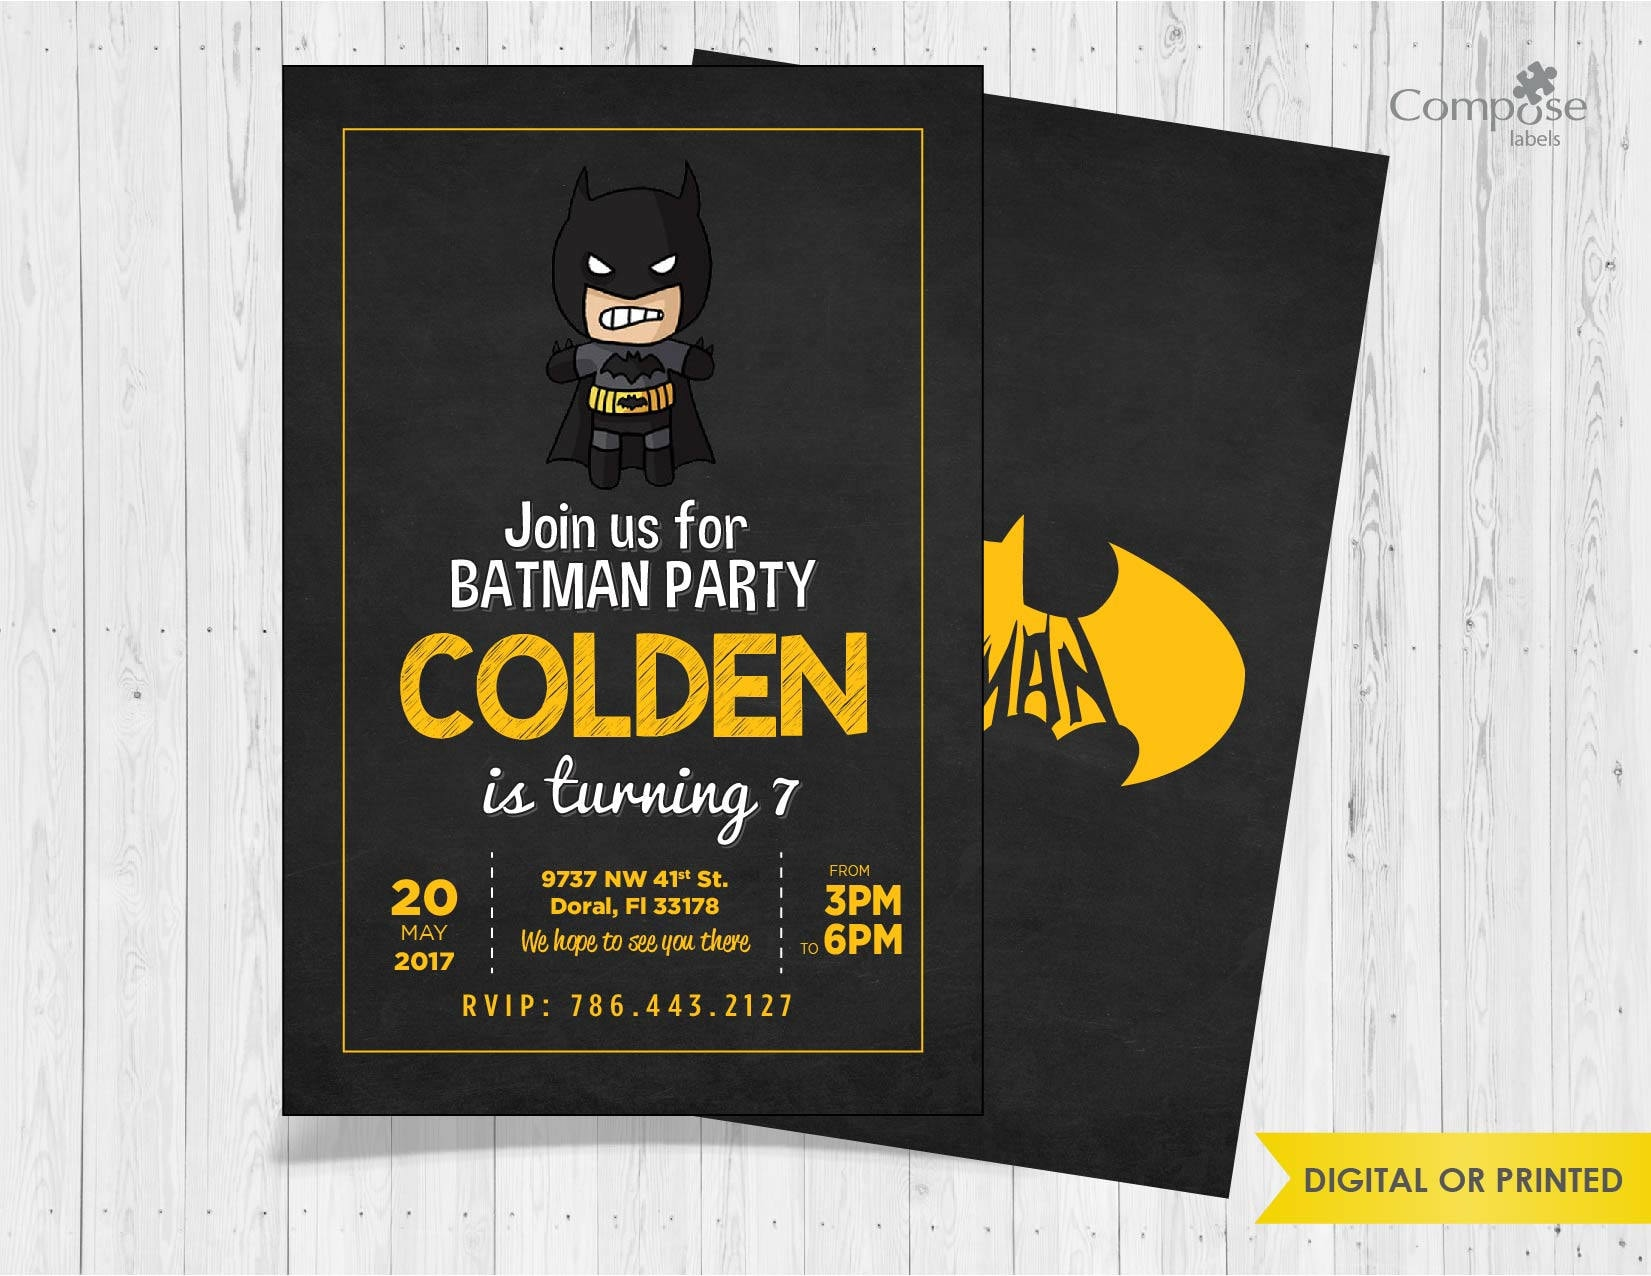 Enchanting Party Invitations Printing Adornment - Invitations Design ...